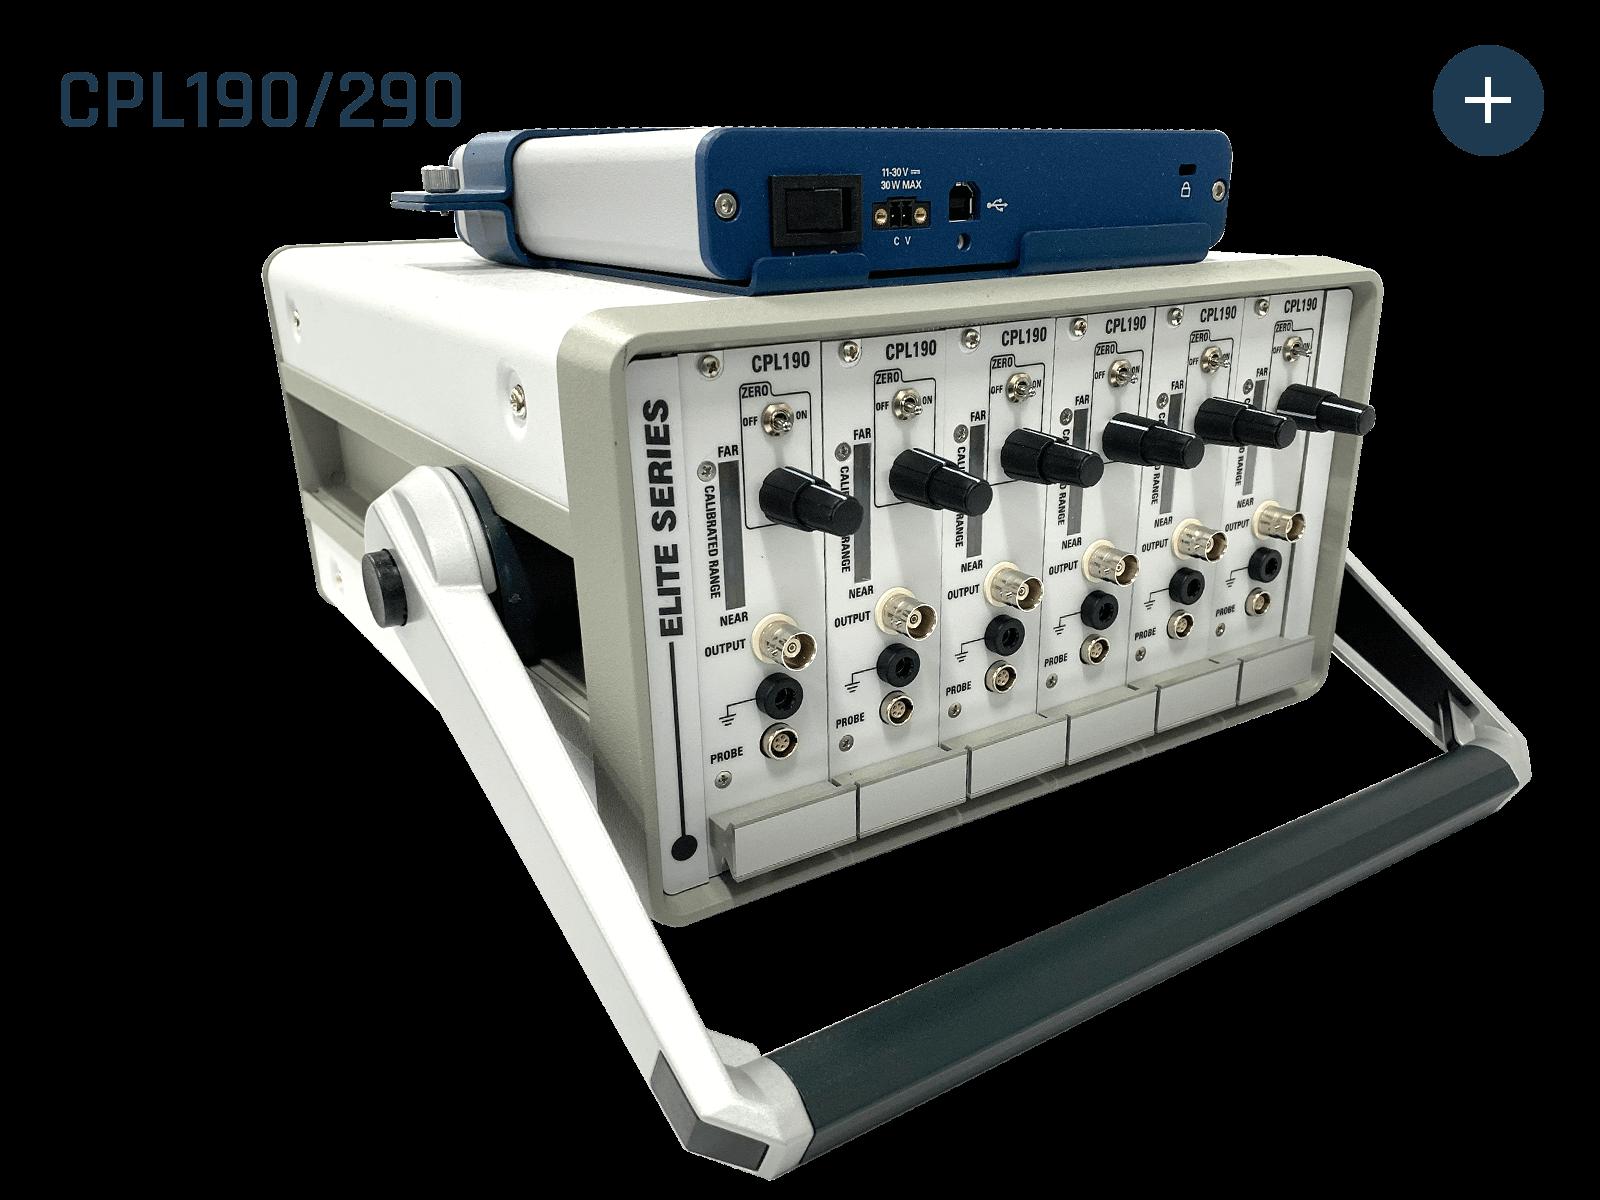 CPL190-290